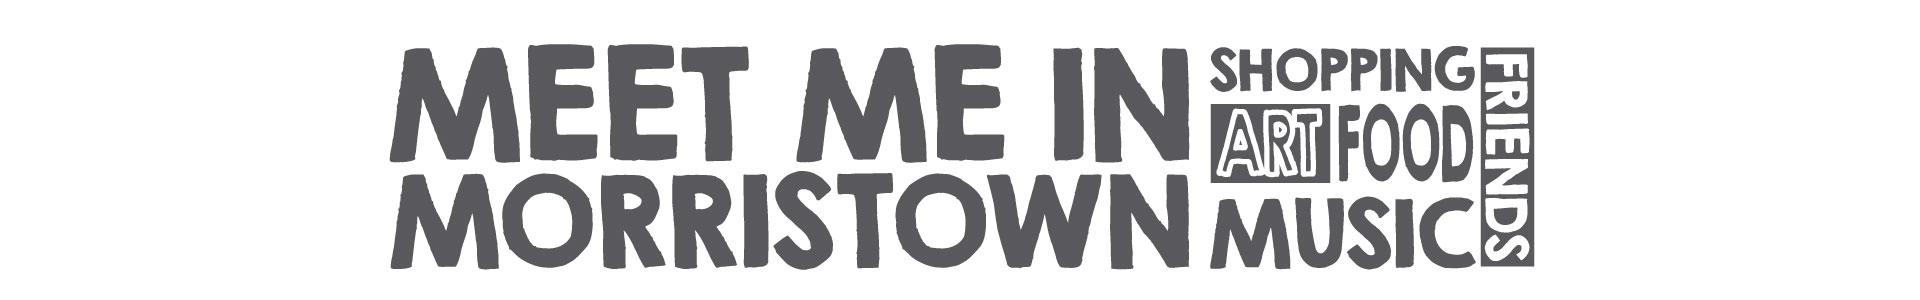 Meet Me in Morristown 2019   Morristown Partnership